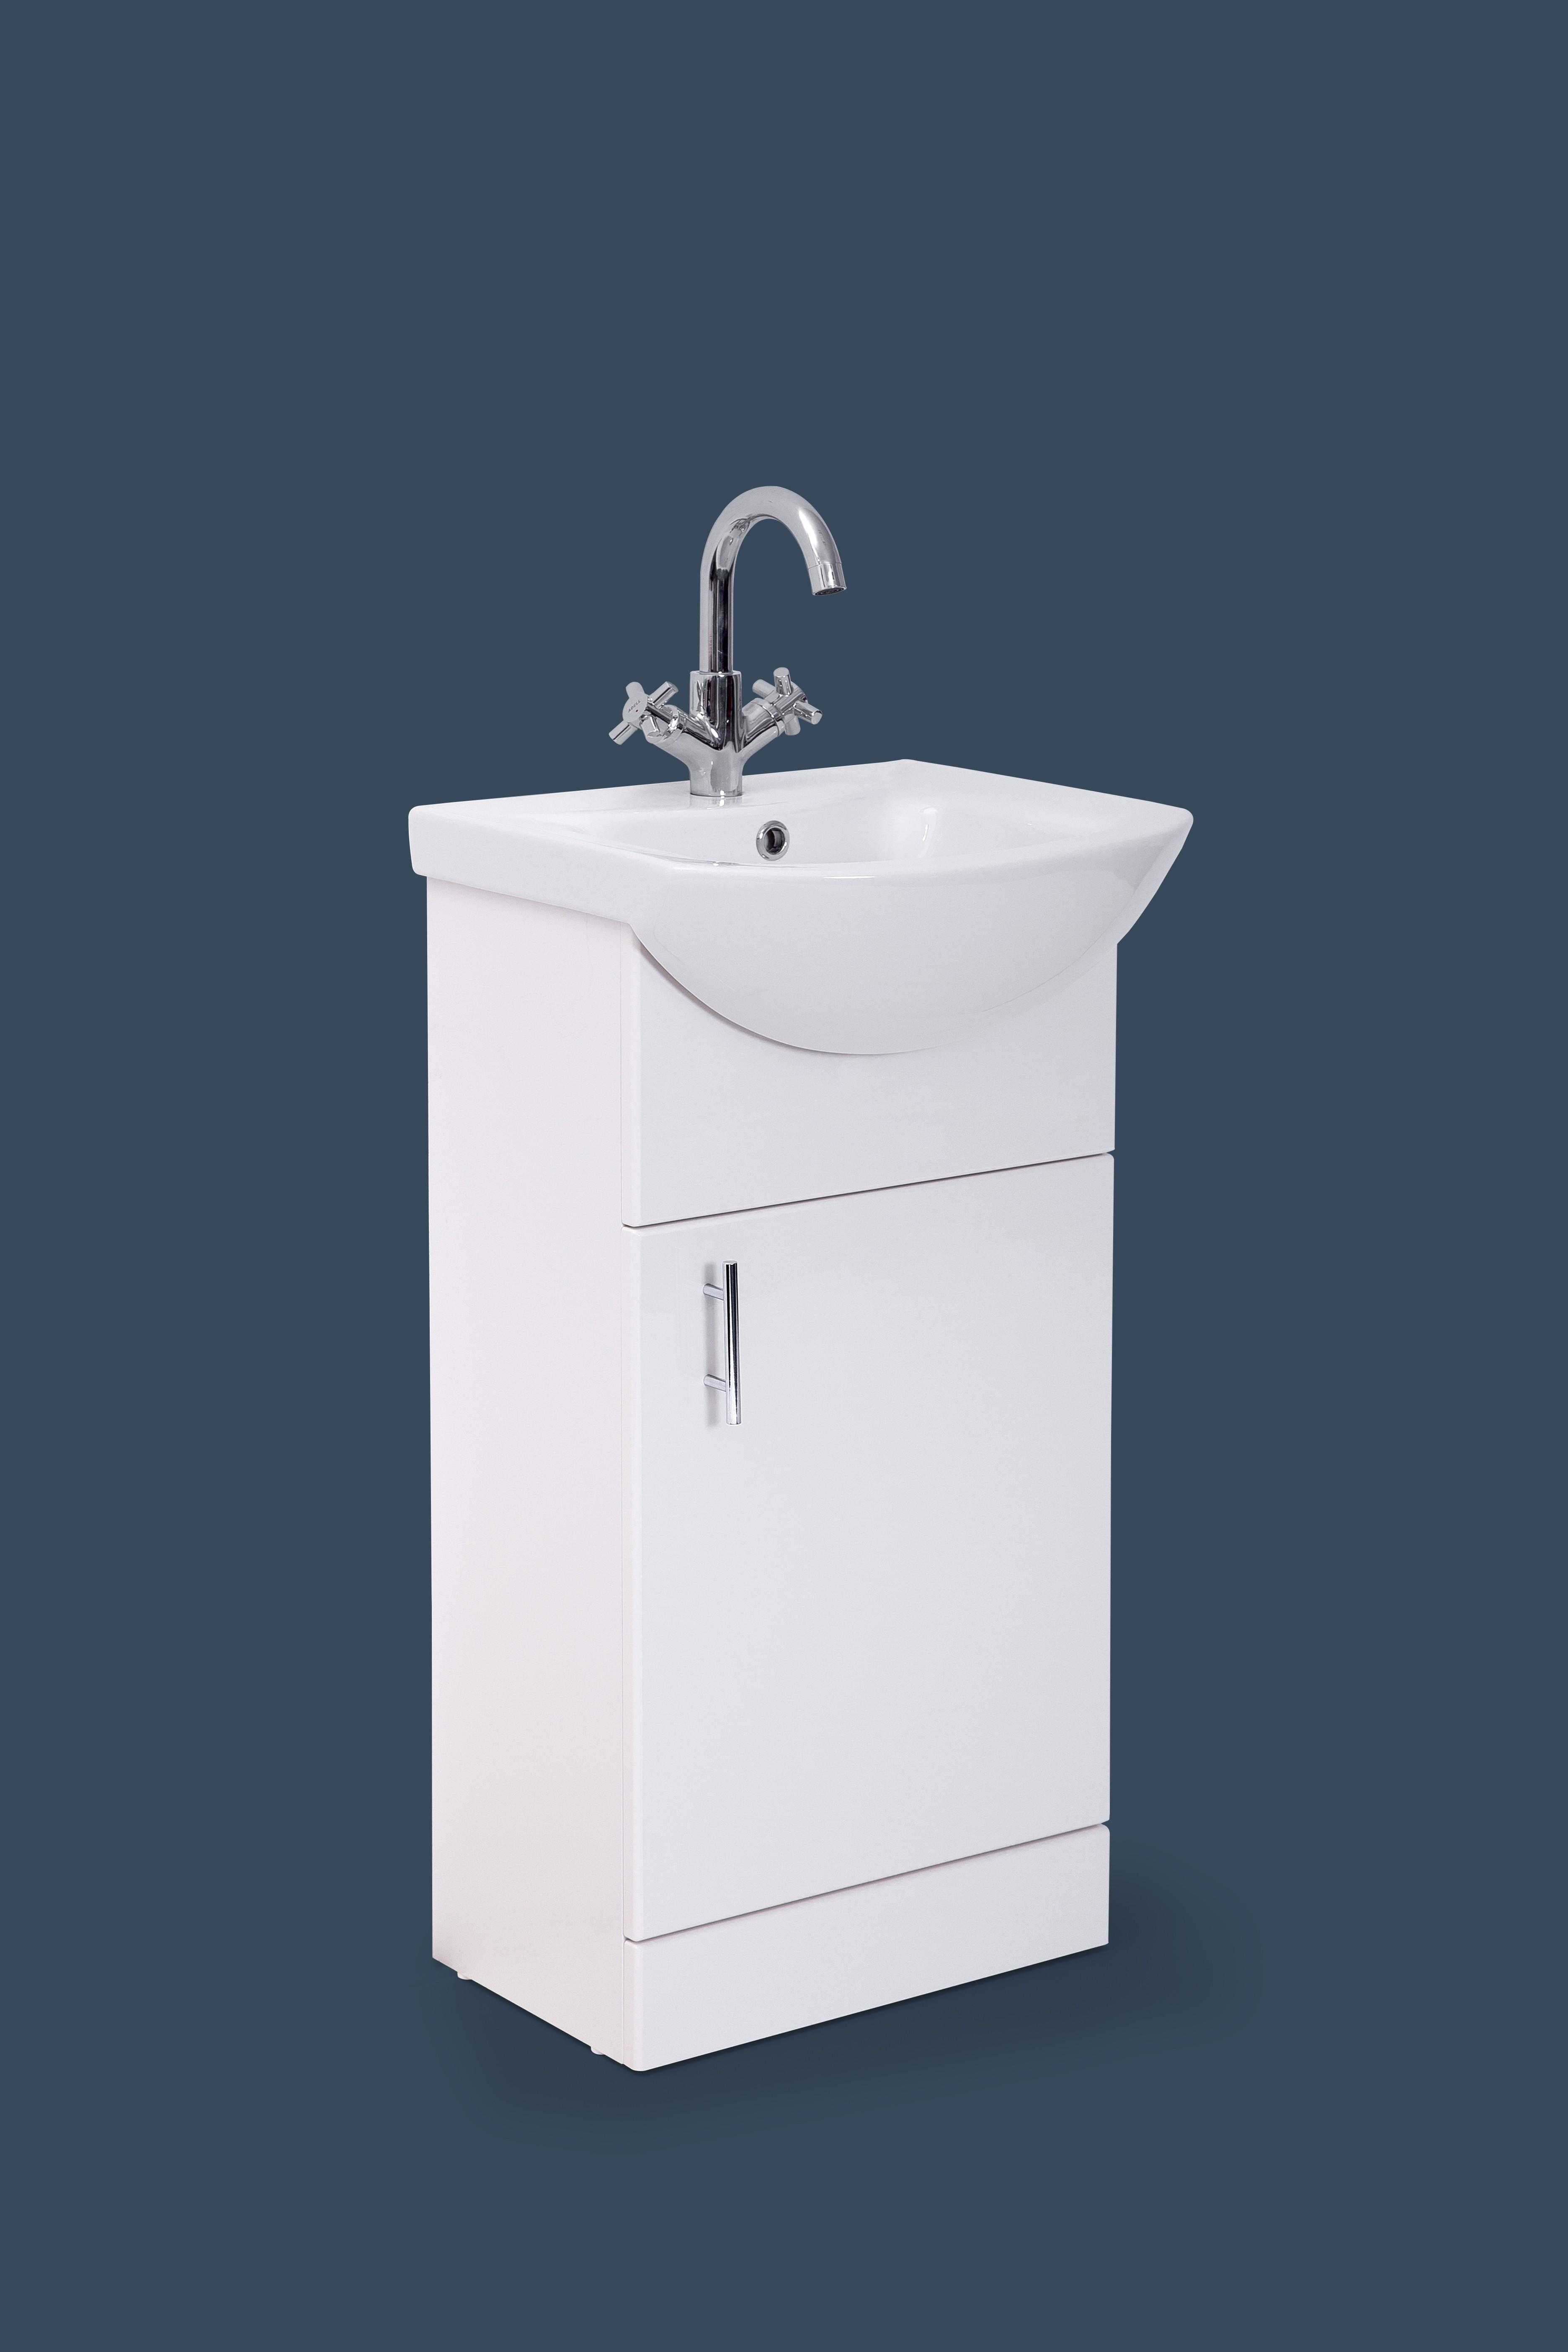 Moderna 450mm Basin and Unit | Niko Bathrooms